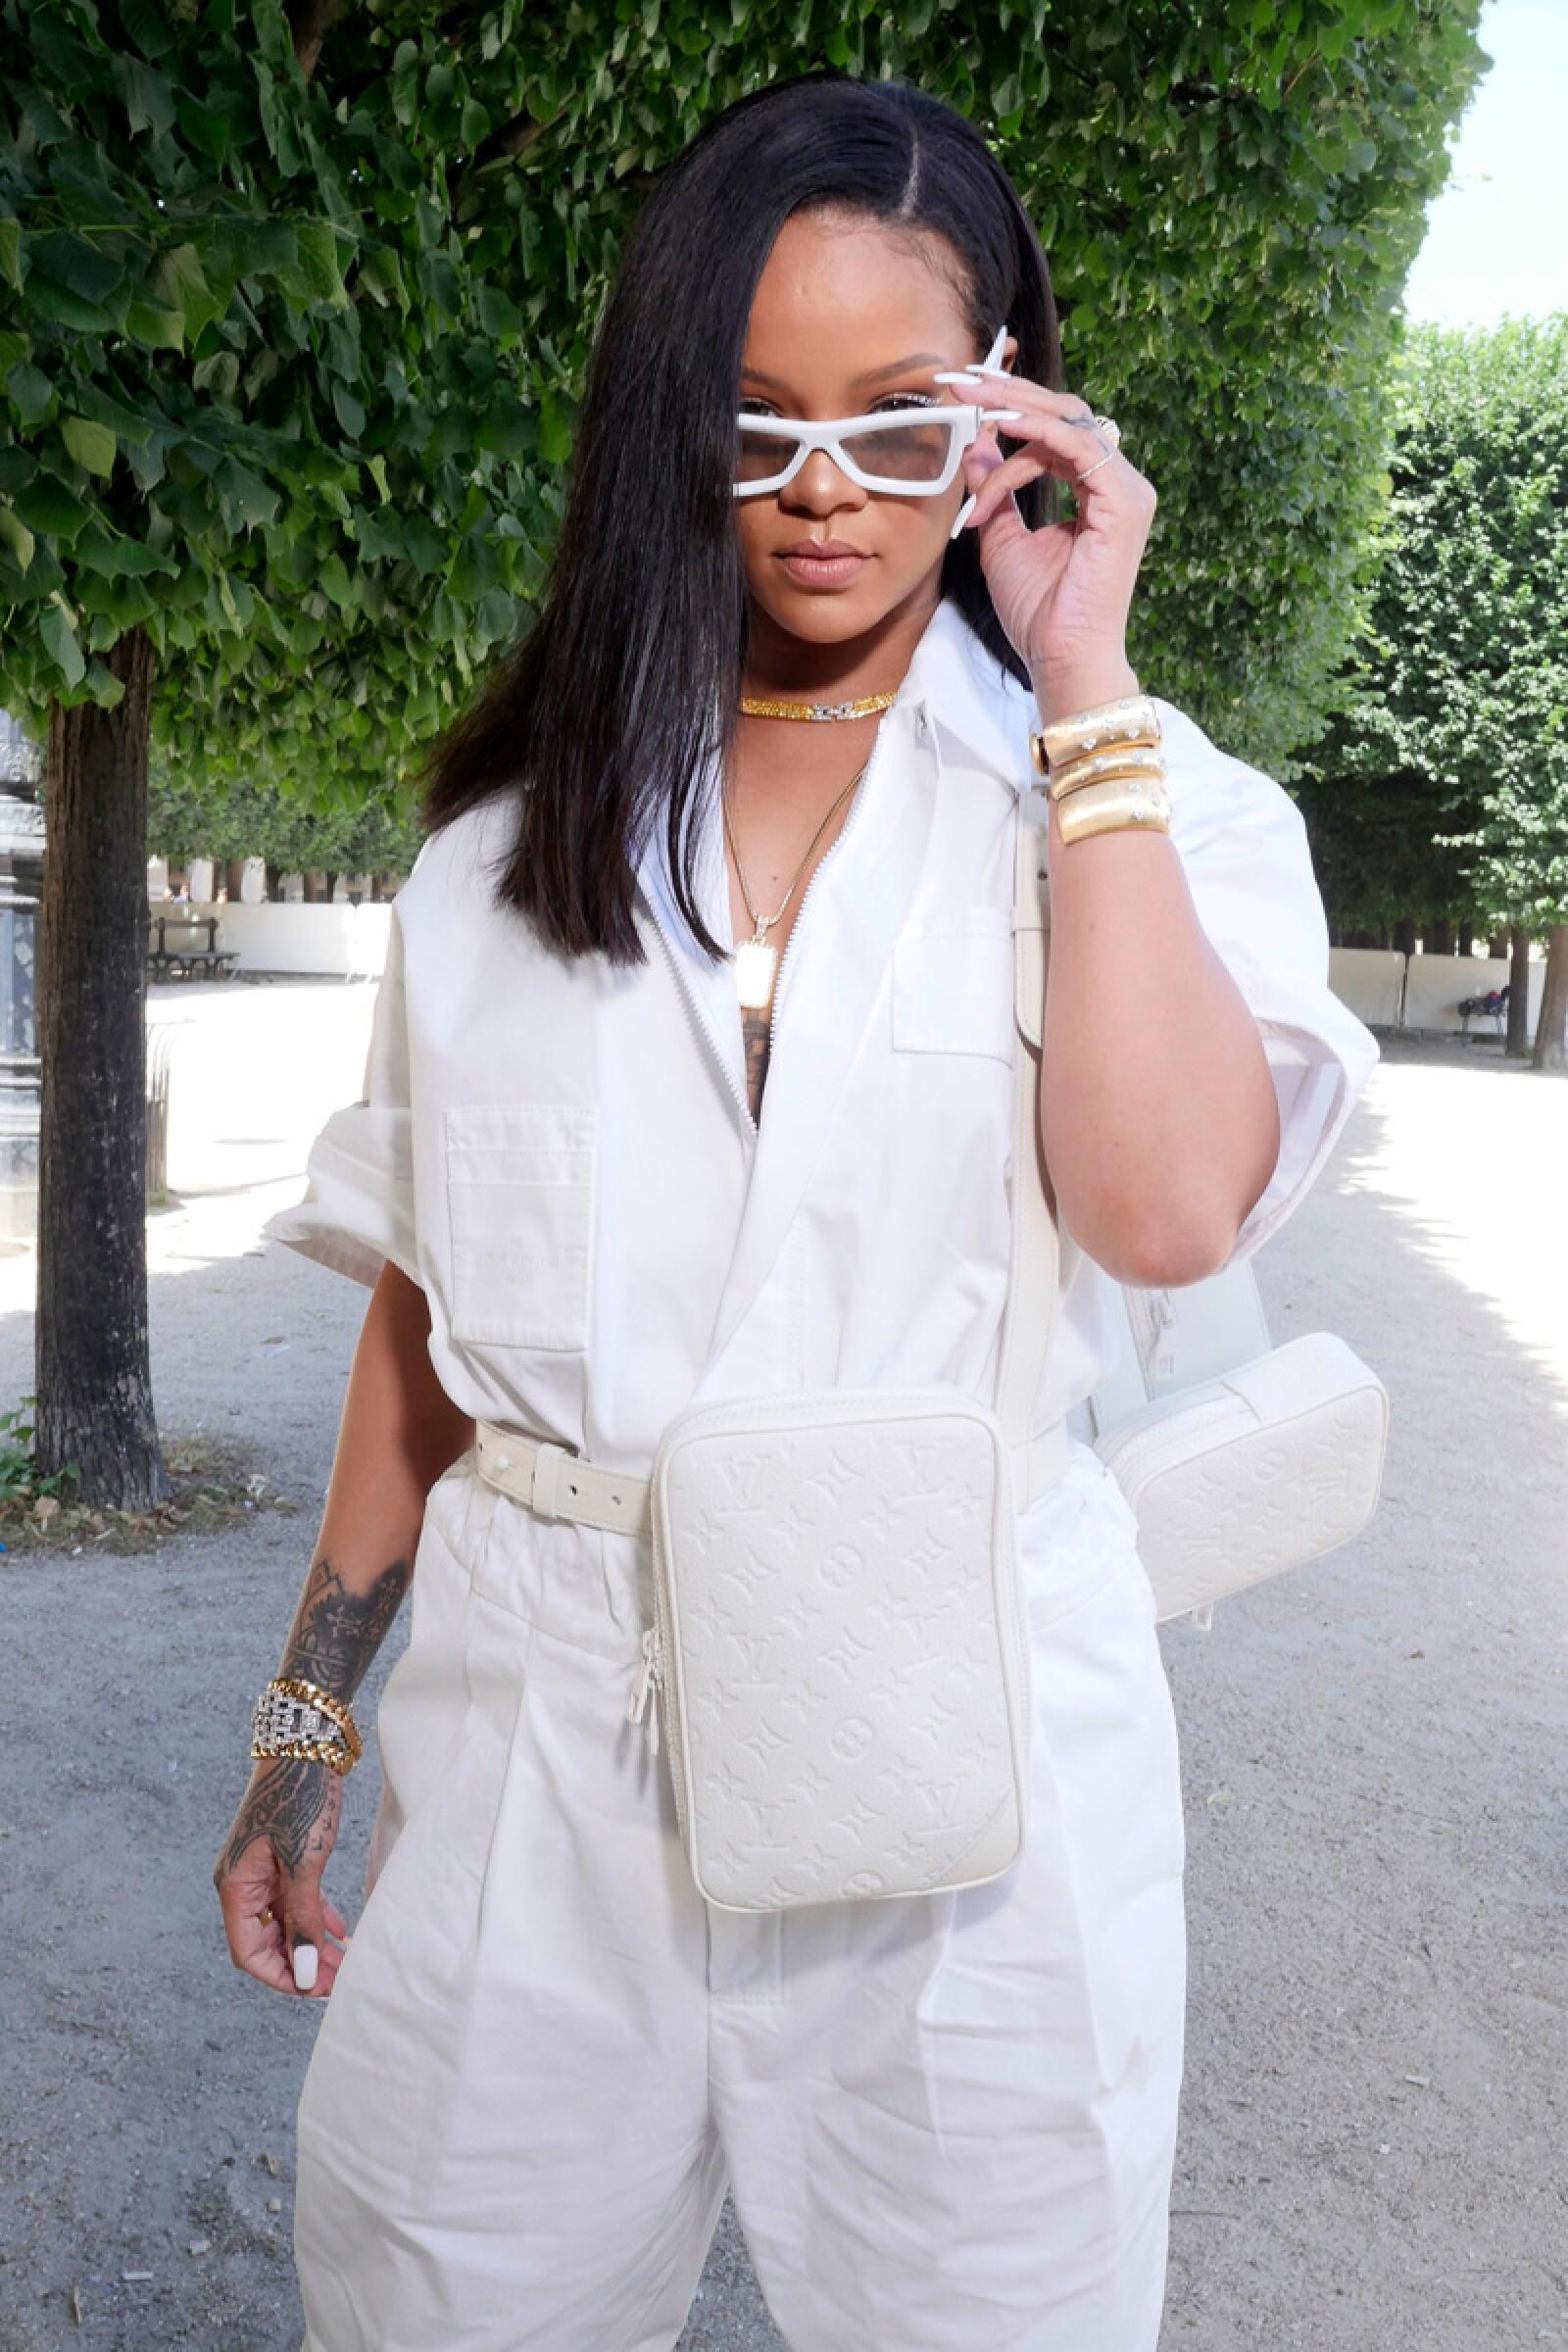 Louis Vuitton show, Front Row, Spring Summer 2019, Paris Fashion Week Men's, France - 21 Jun 2018